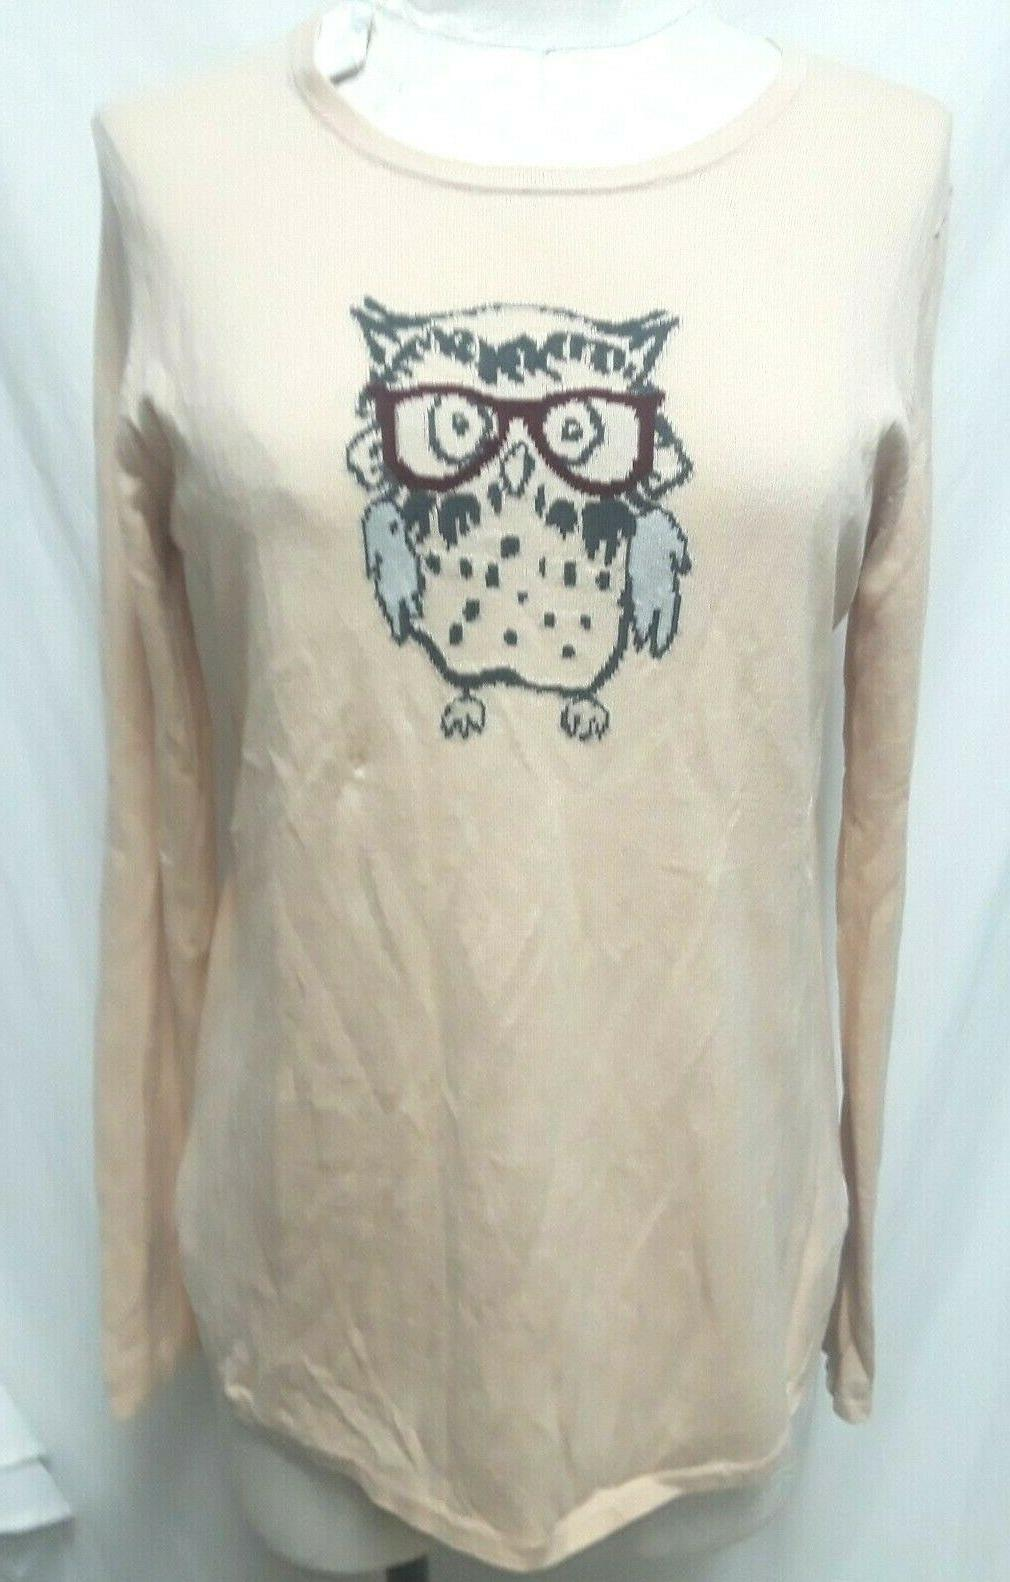 owl w eye glasses knit sweater top